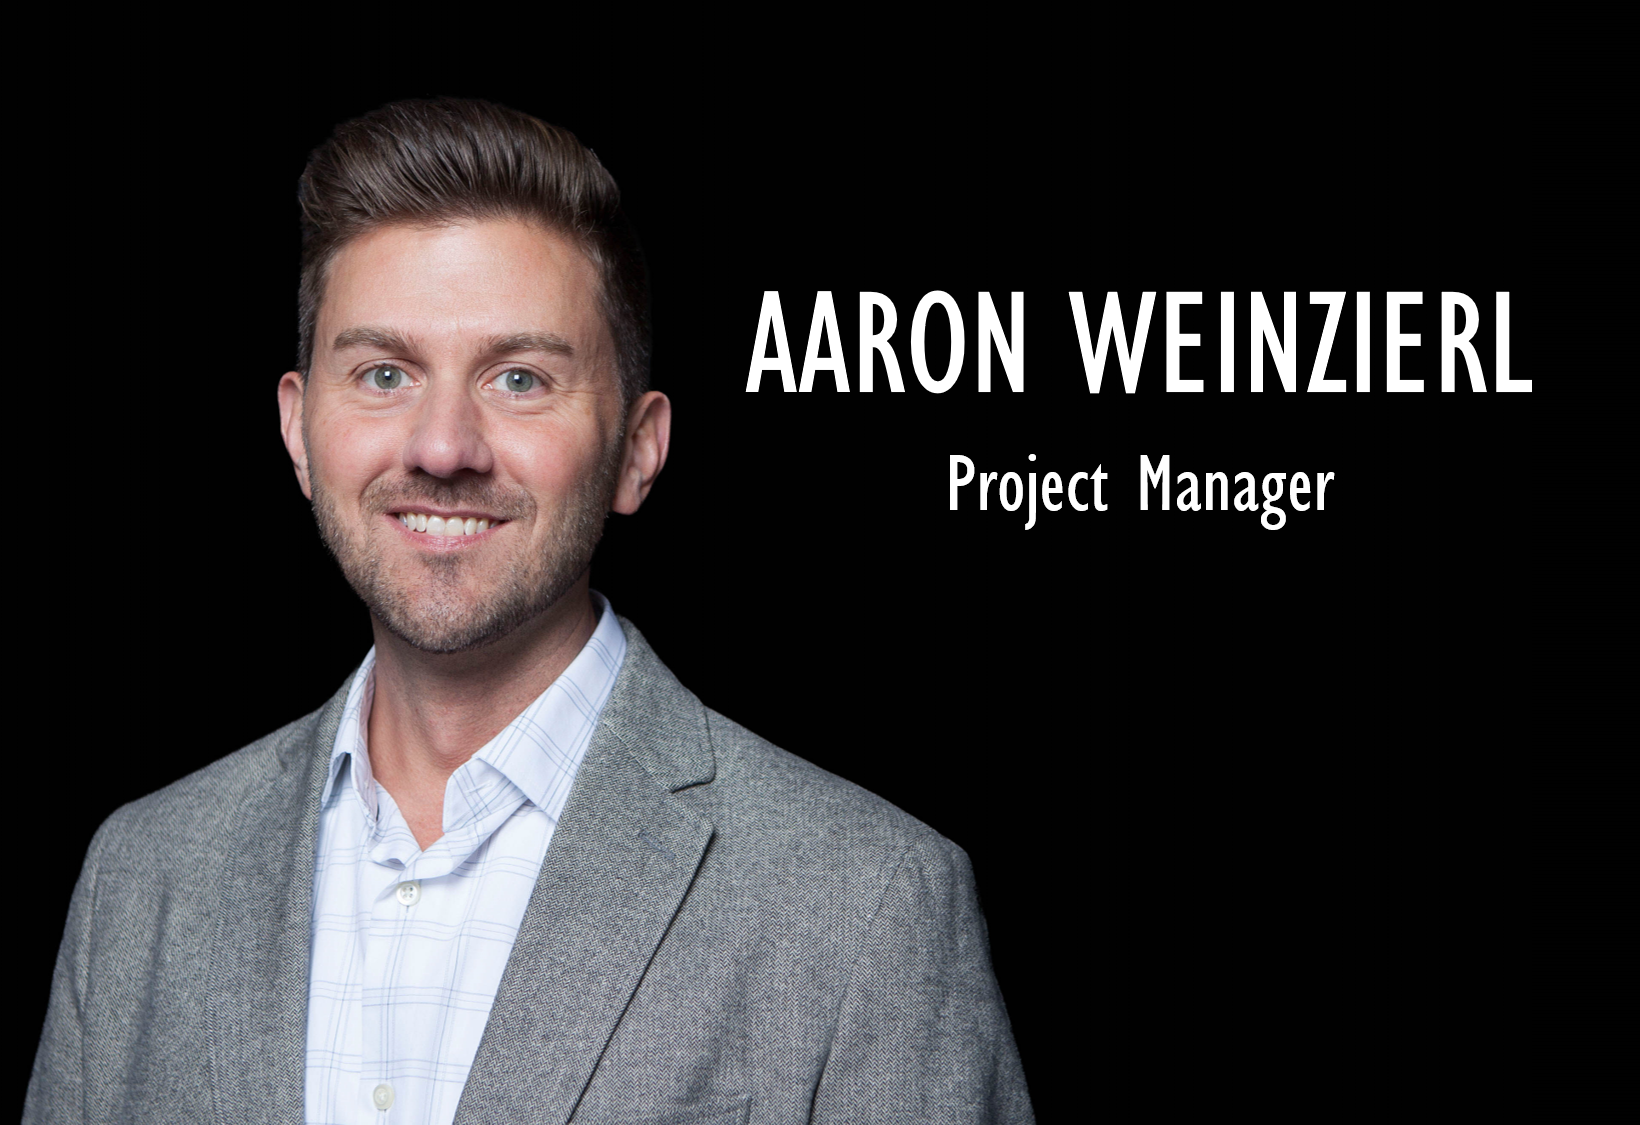 Aaron Weinzierl